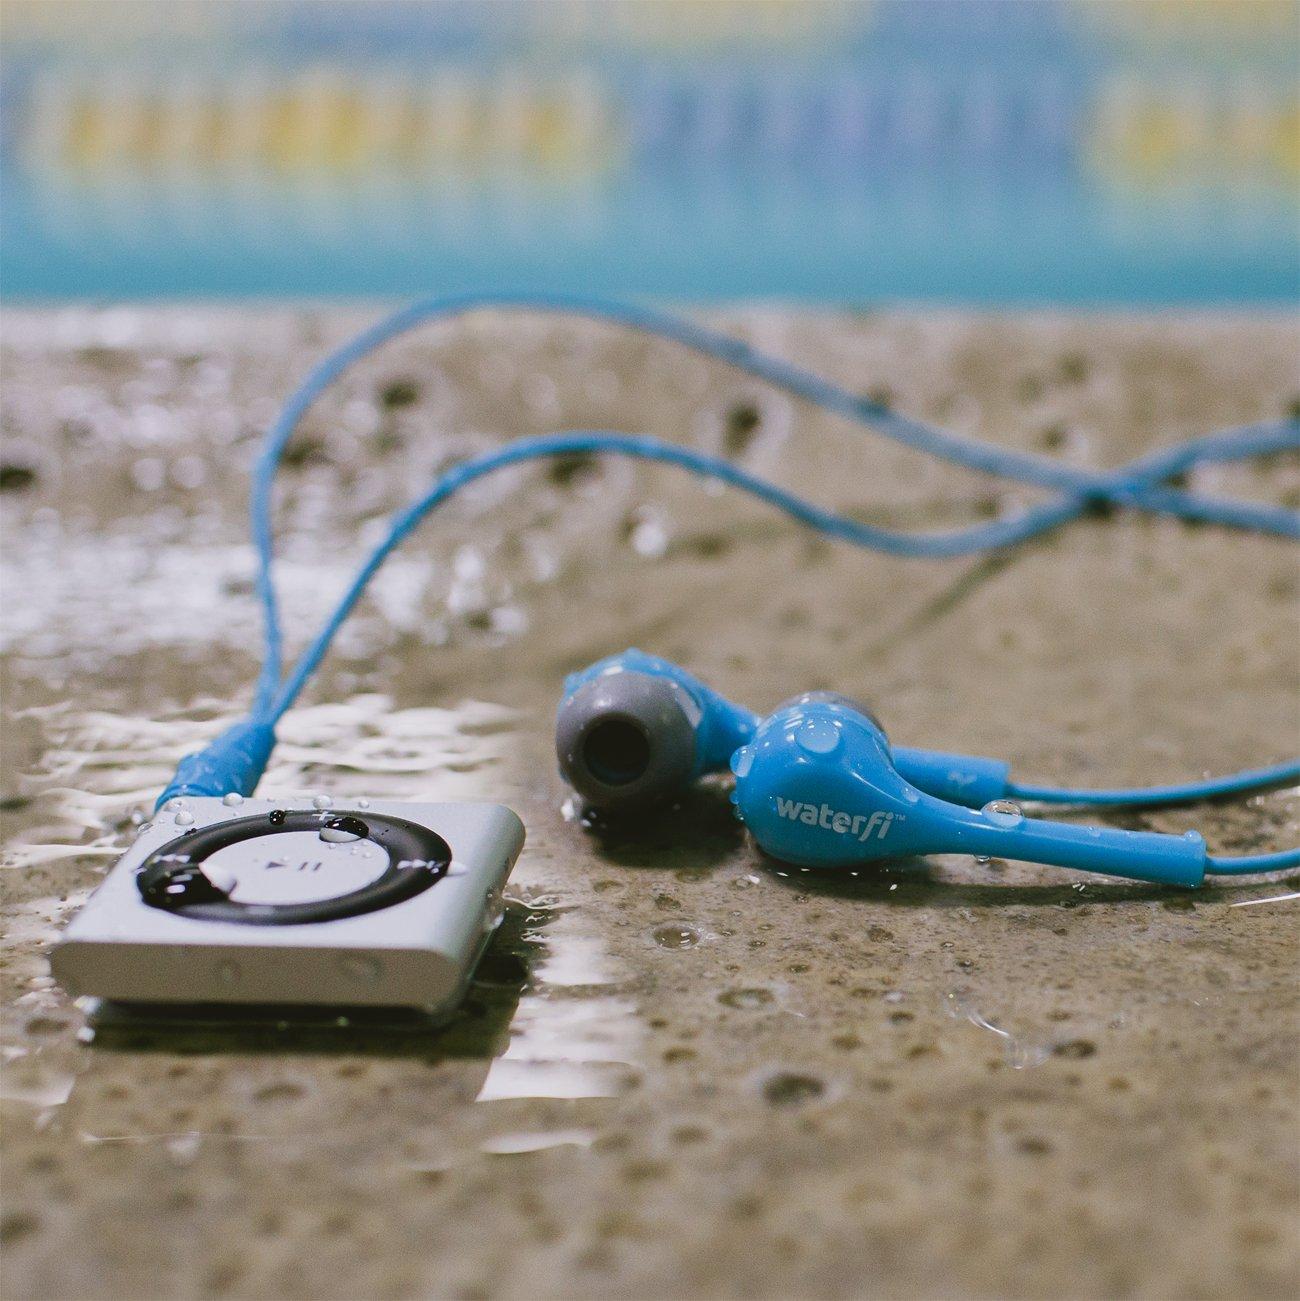 Waterfi waterproof apple ipod with Short Cord Waterproof HeadPhones - Best Swimming Mp3 Player